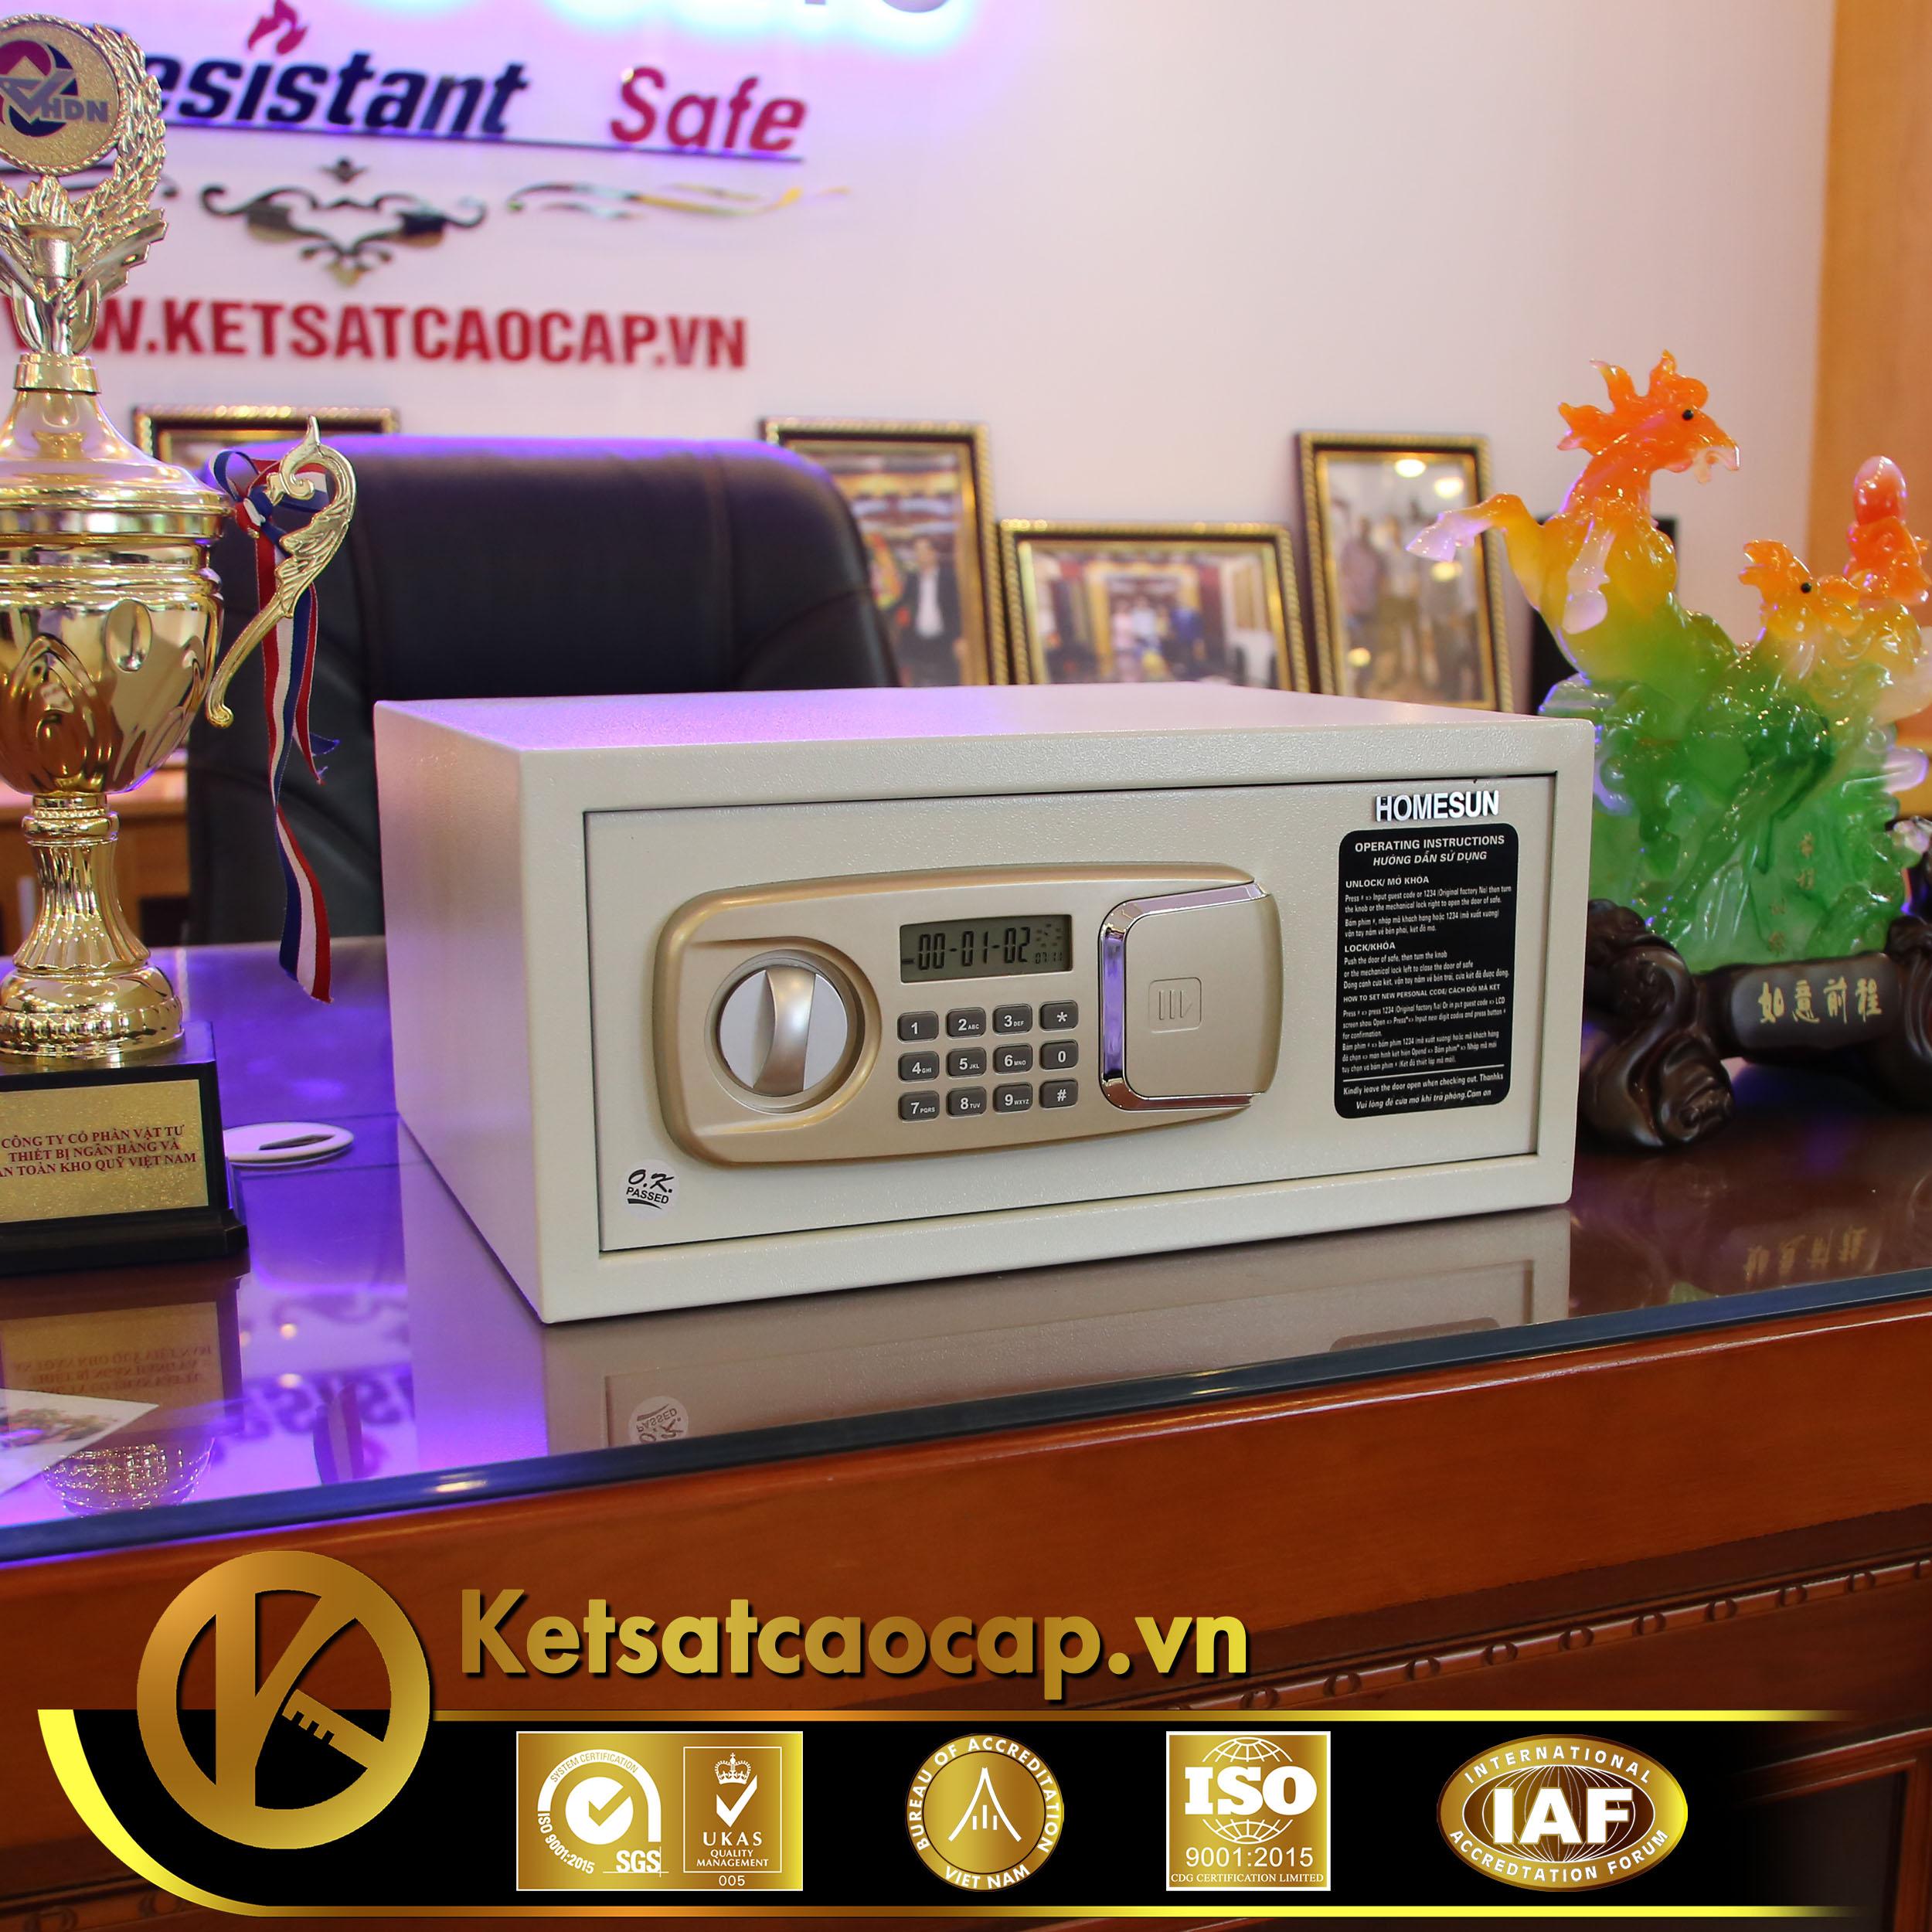 cửa hàng bán ket sat khach san gia re Phu Quoc Hotel safe